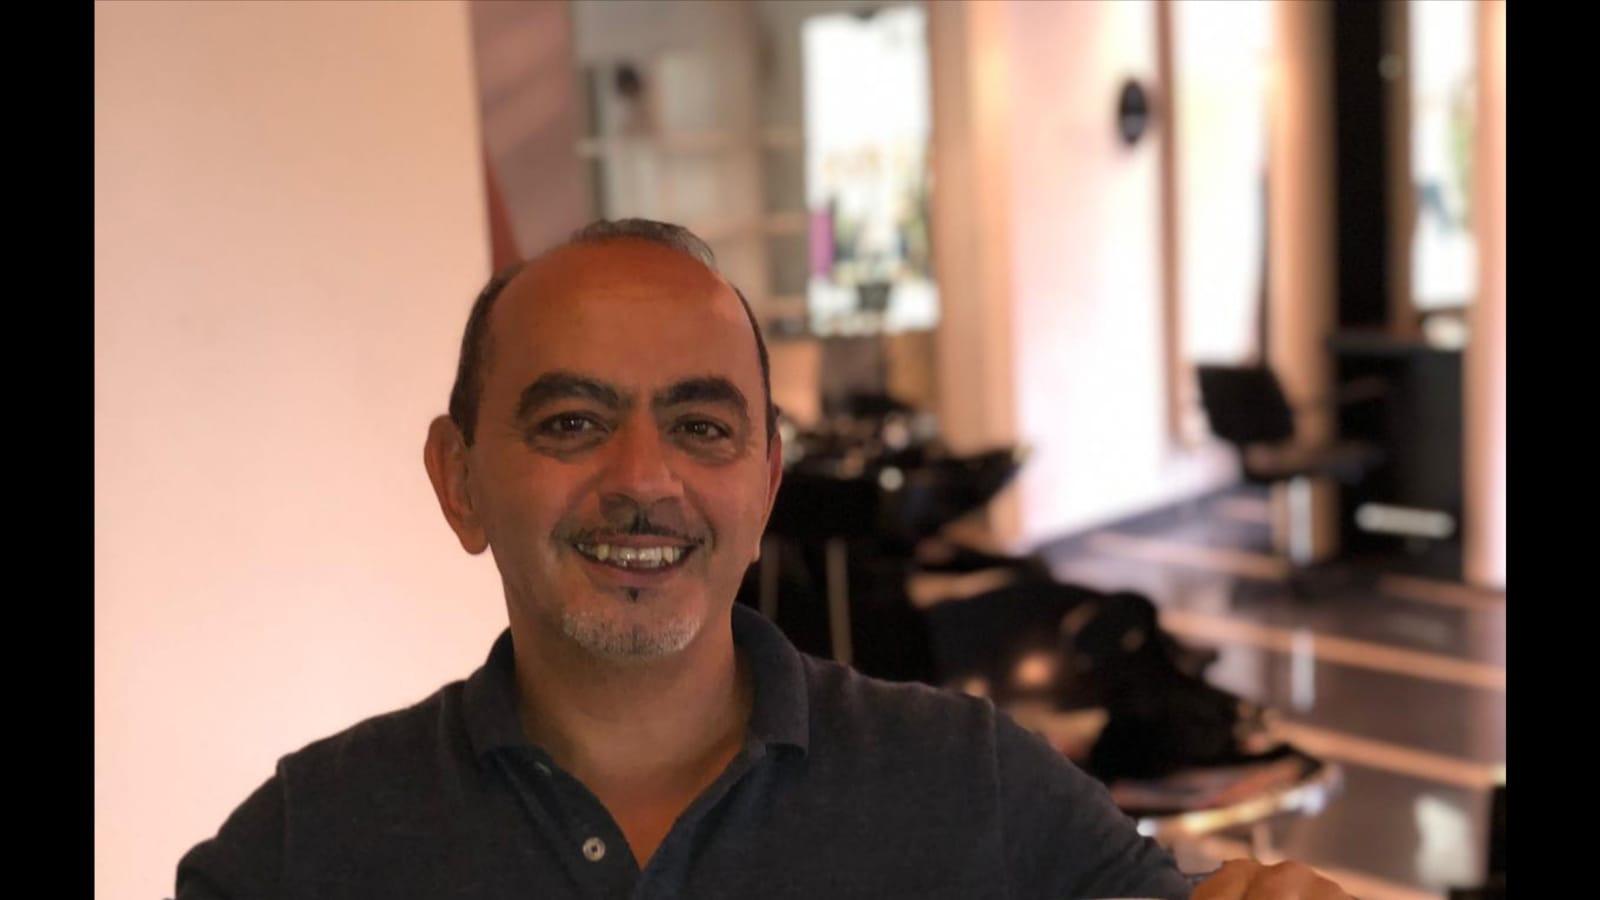 Ali Tsouli, eigenaar van kapsalon Kapper Alissandro in Breda.